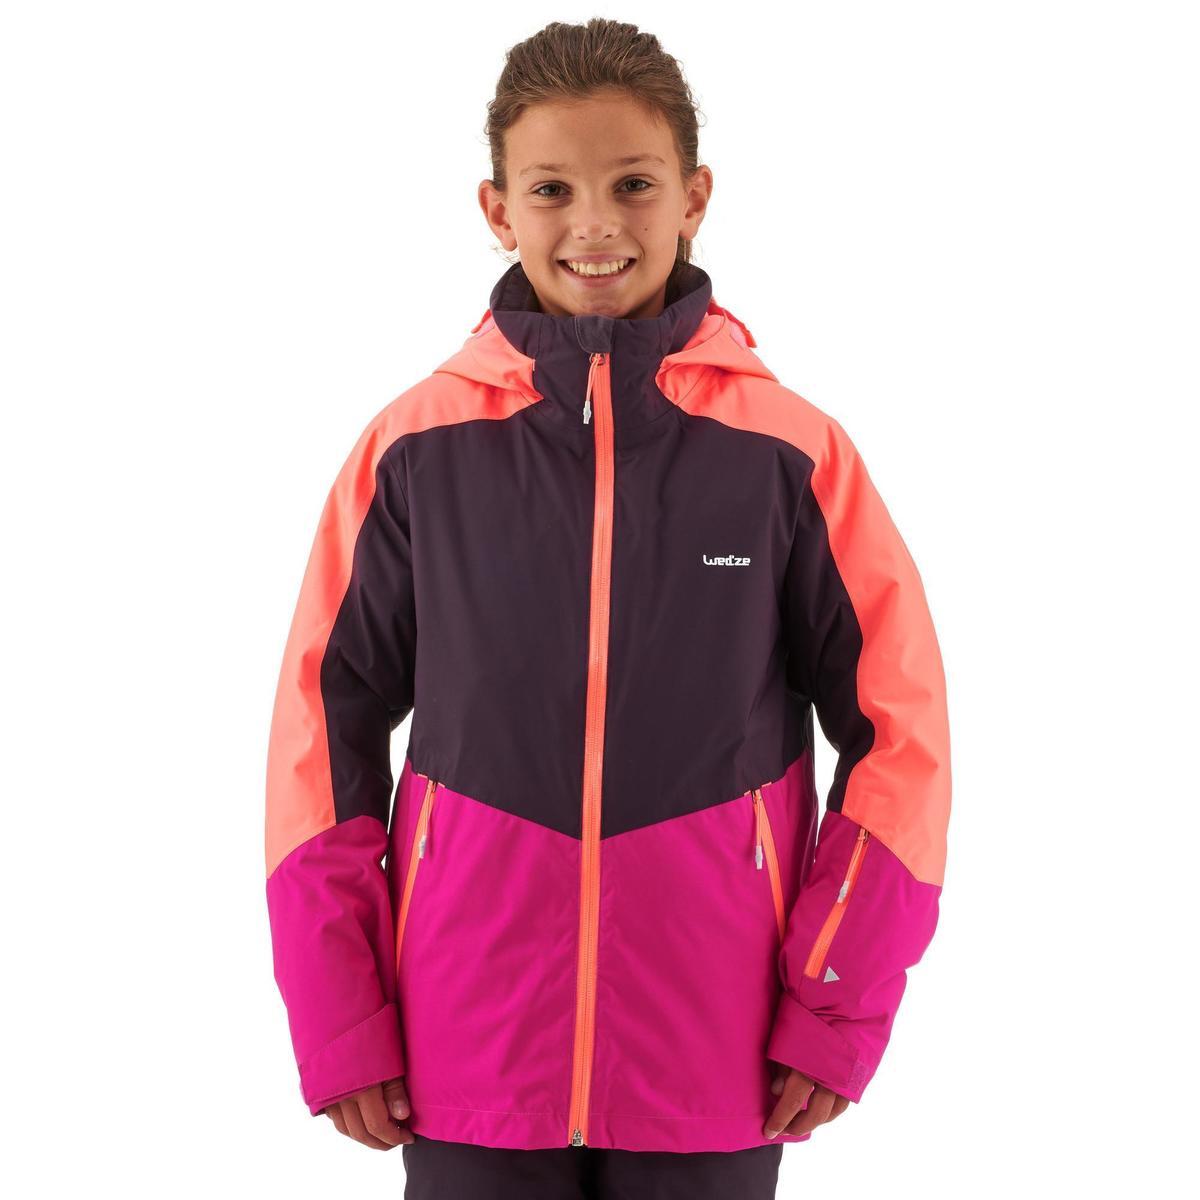 Bild 3 von Skijacke Piste 580 Kinder rosa/violett